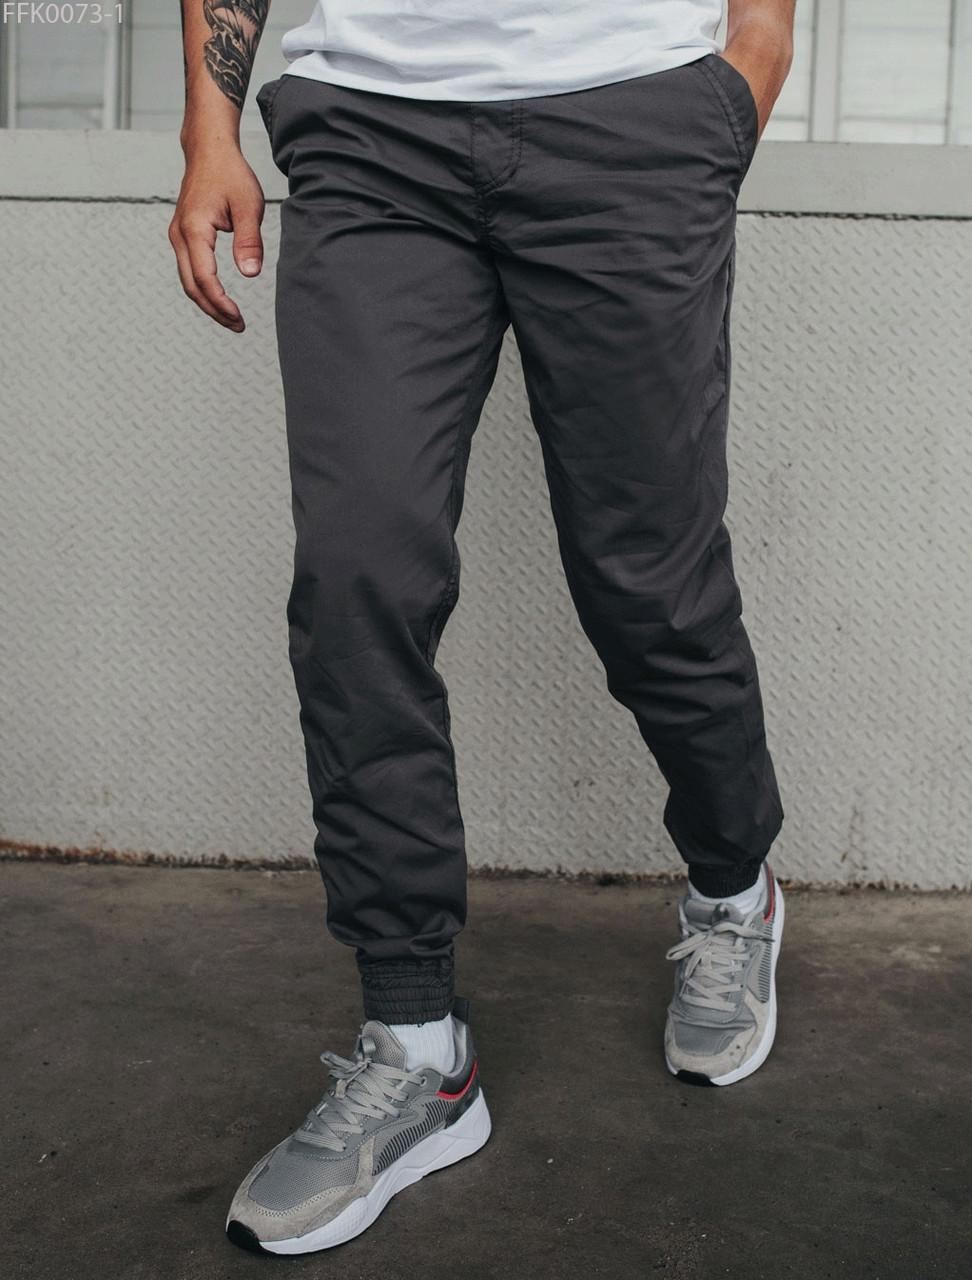 Джоггеры Staff gray XS